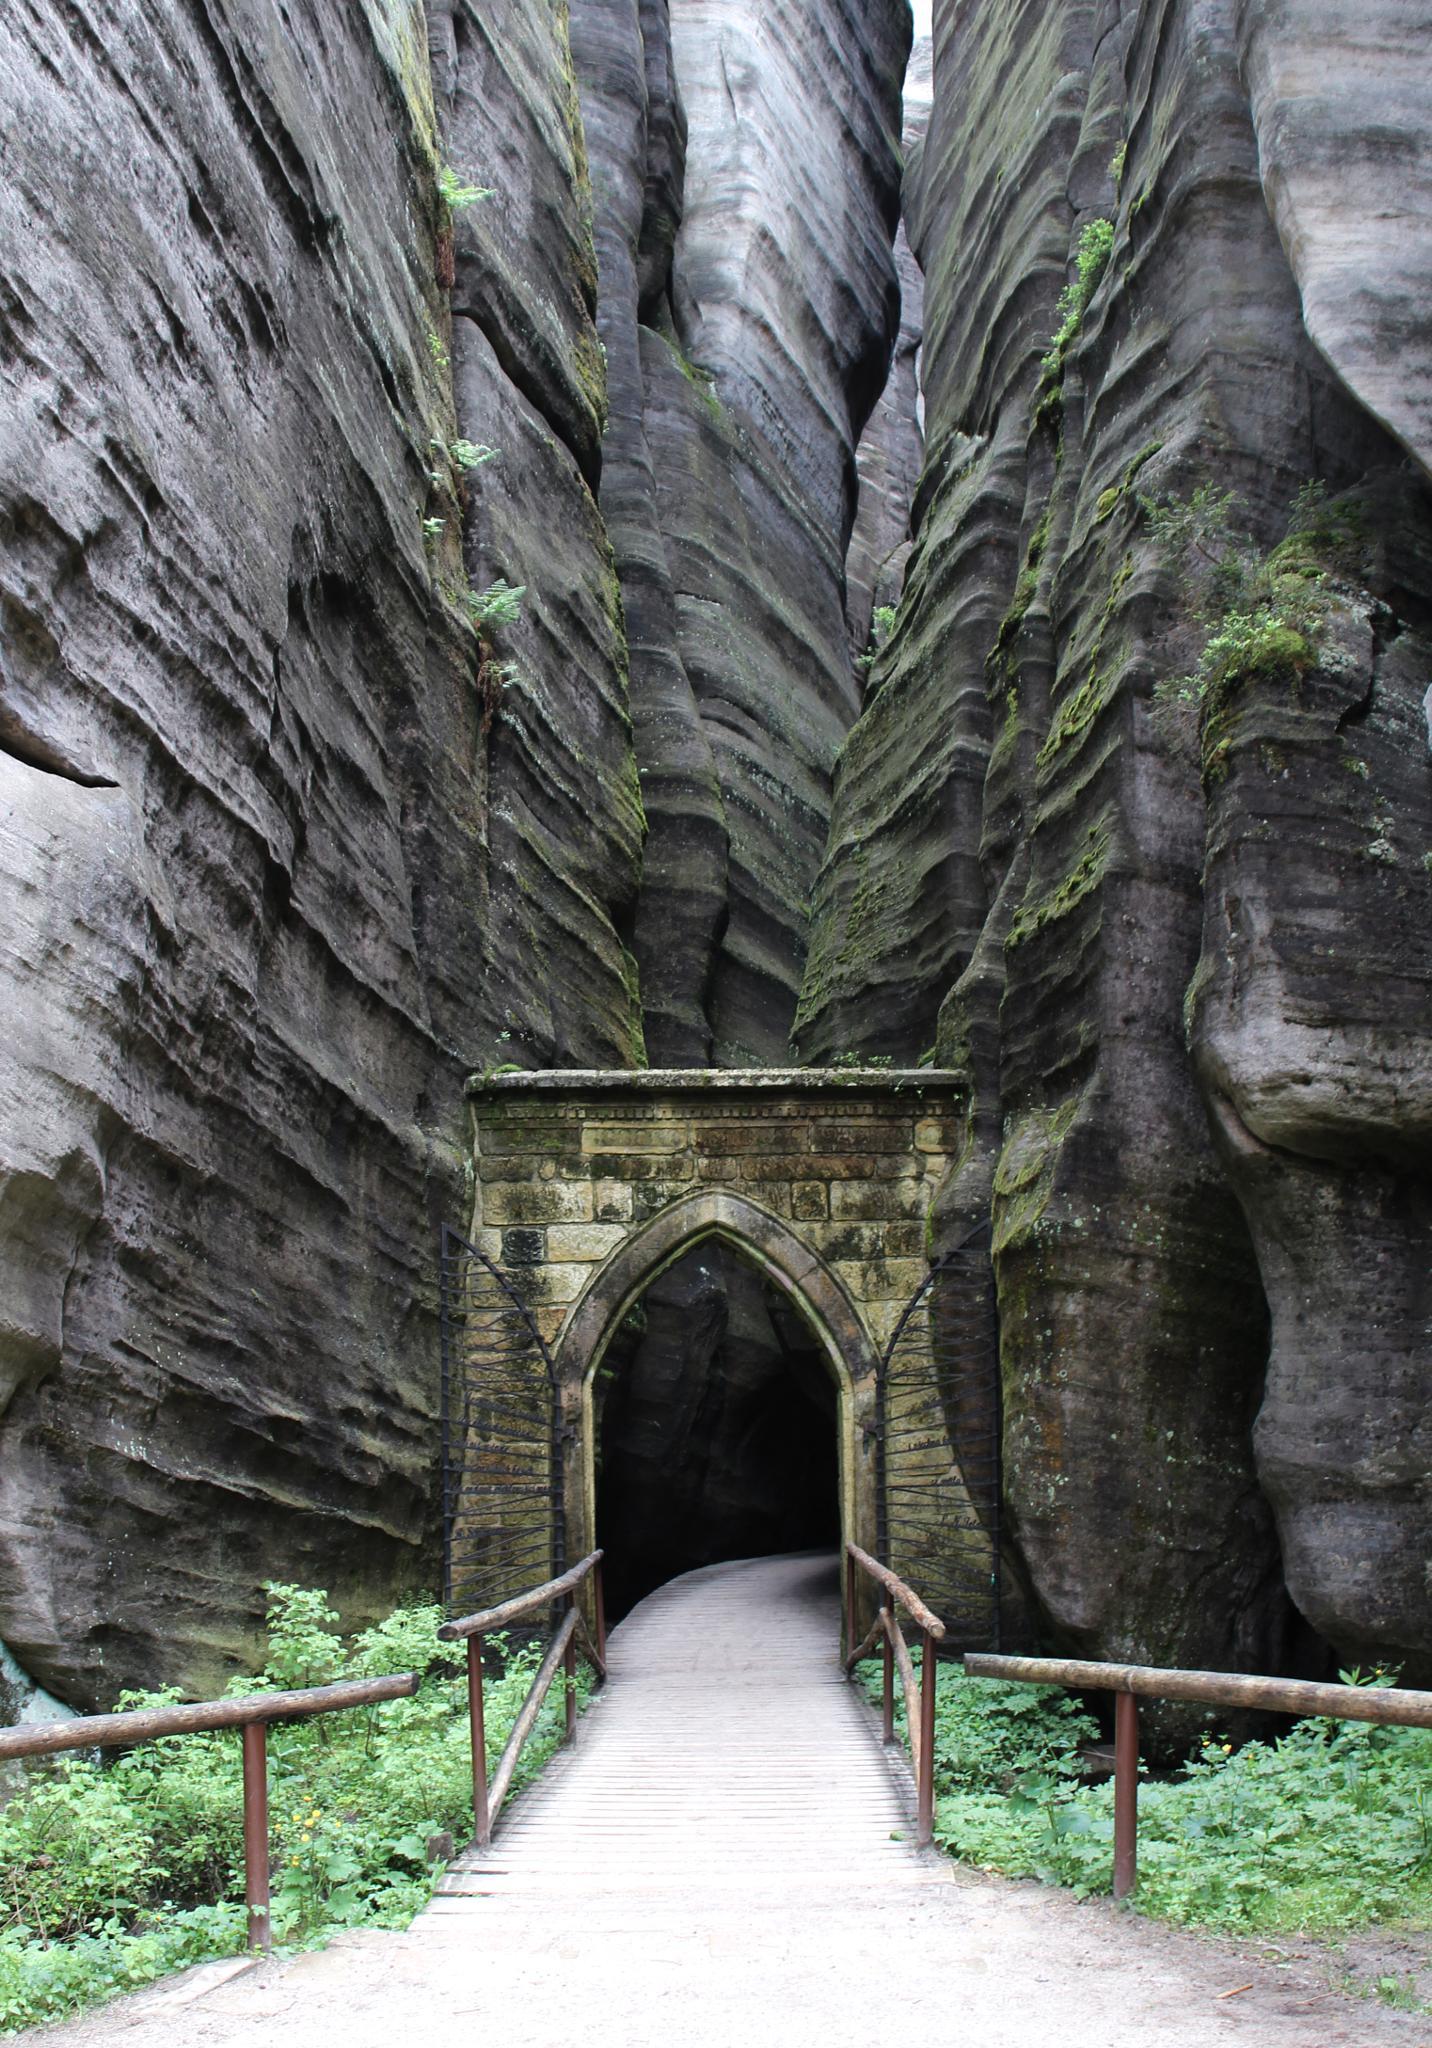 Adršpach-Teplicer Felsen - Eingang by Heidi Stenmans